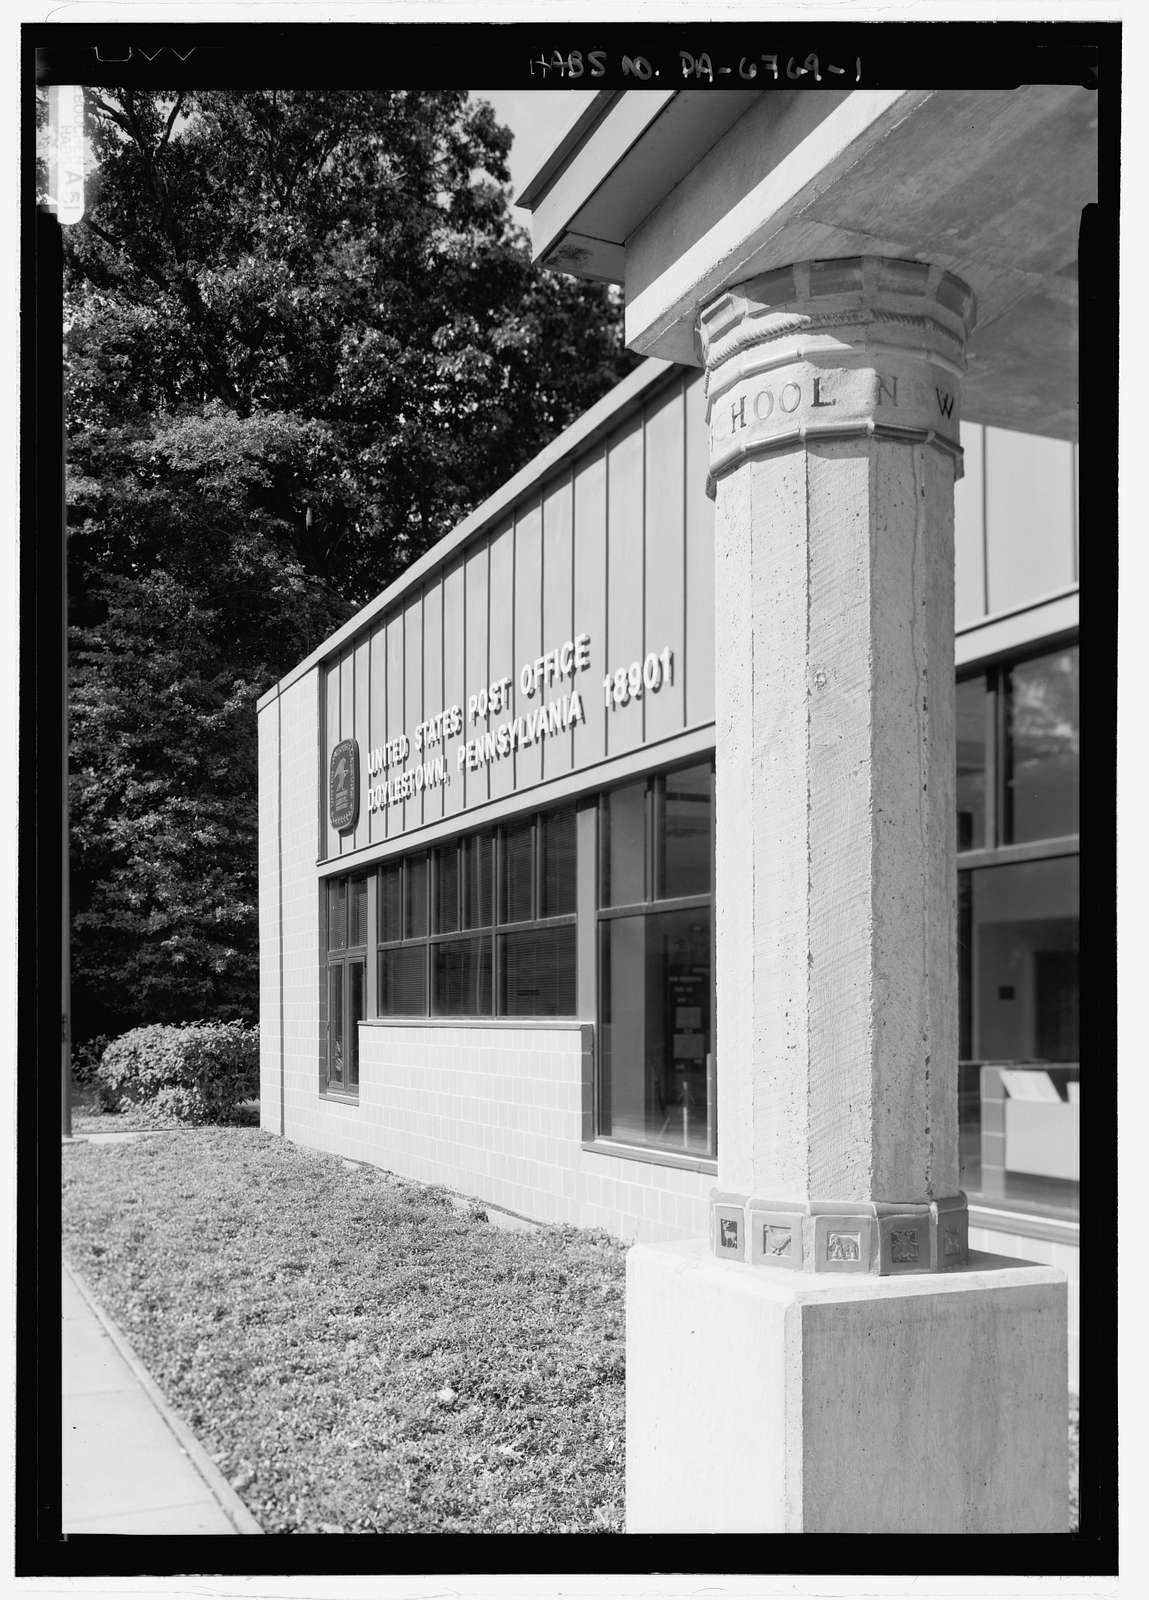 Doylestown Post Office, Doylestown, Bucks County, PA